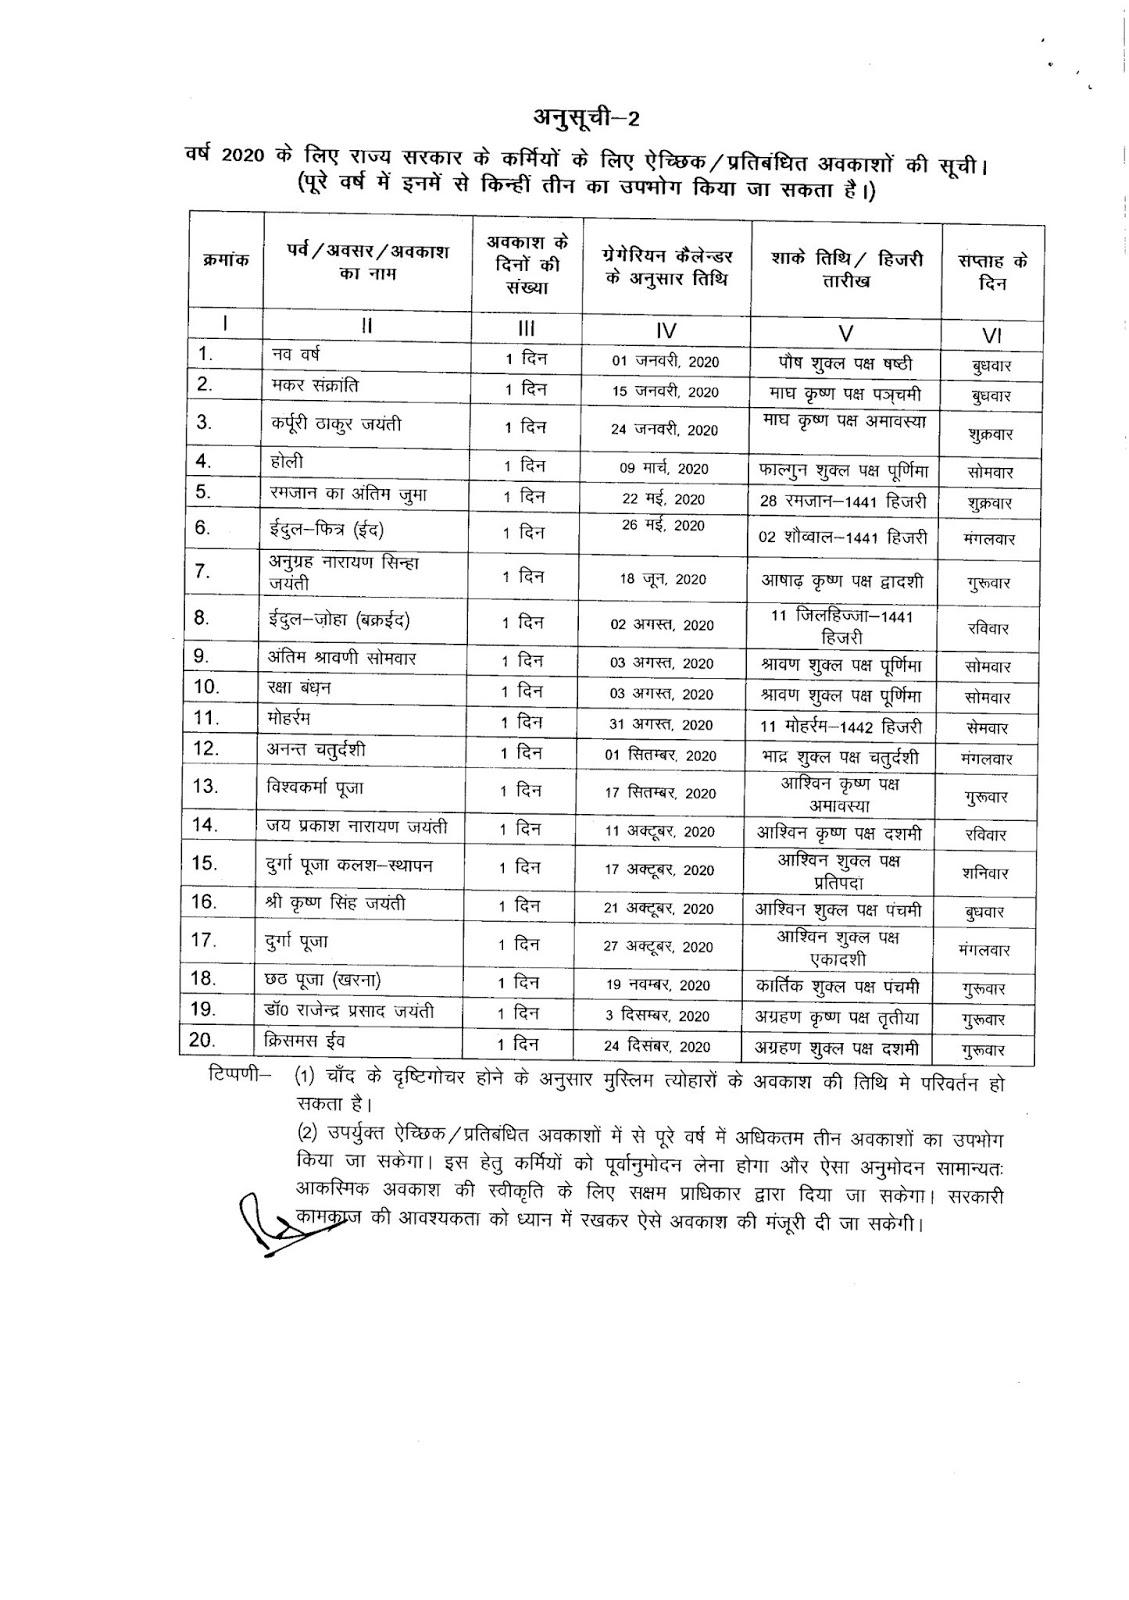 Bihar Government Calendar 2020 #educratsweb inside Bihar Sarkar Calendra 2020